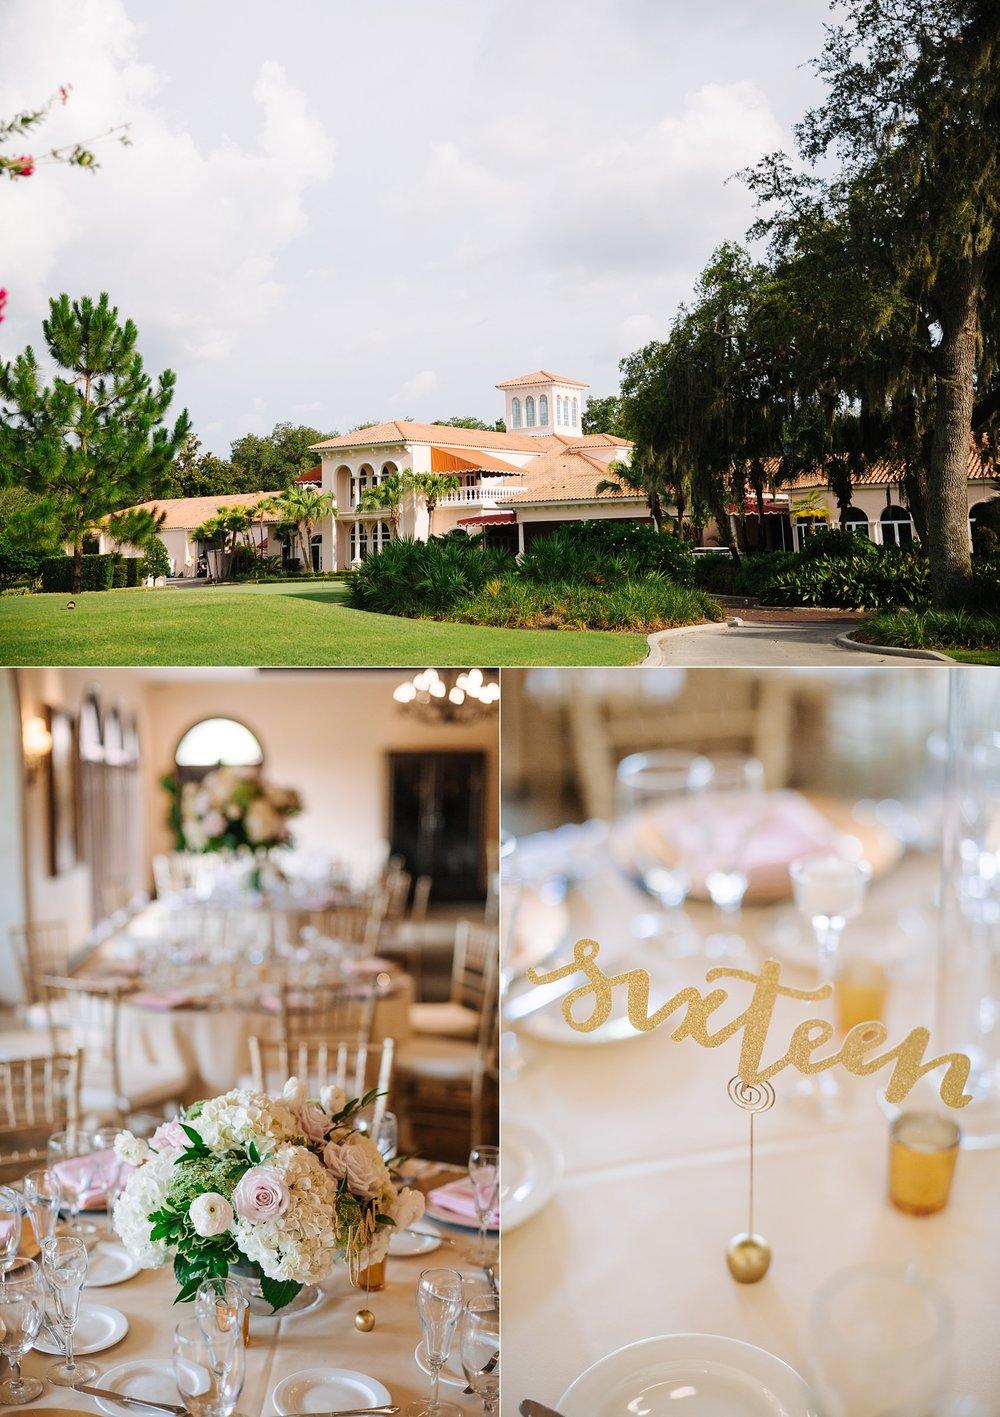 avila country club wedding: elegant pink details